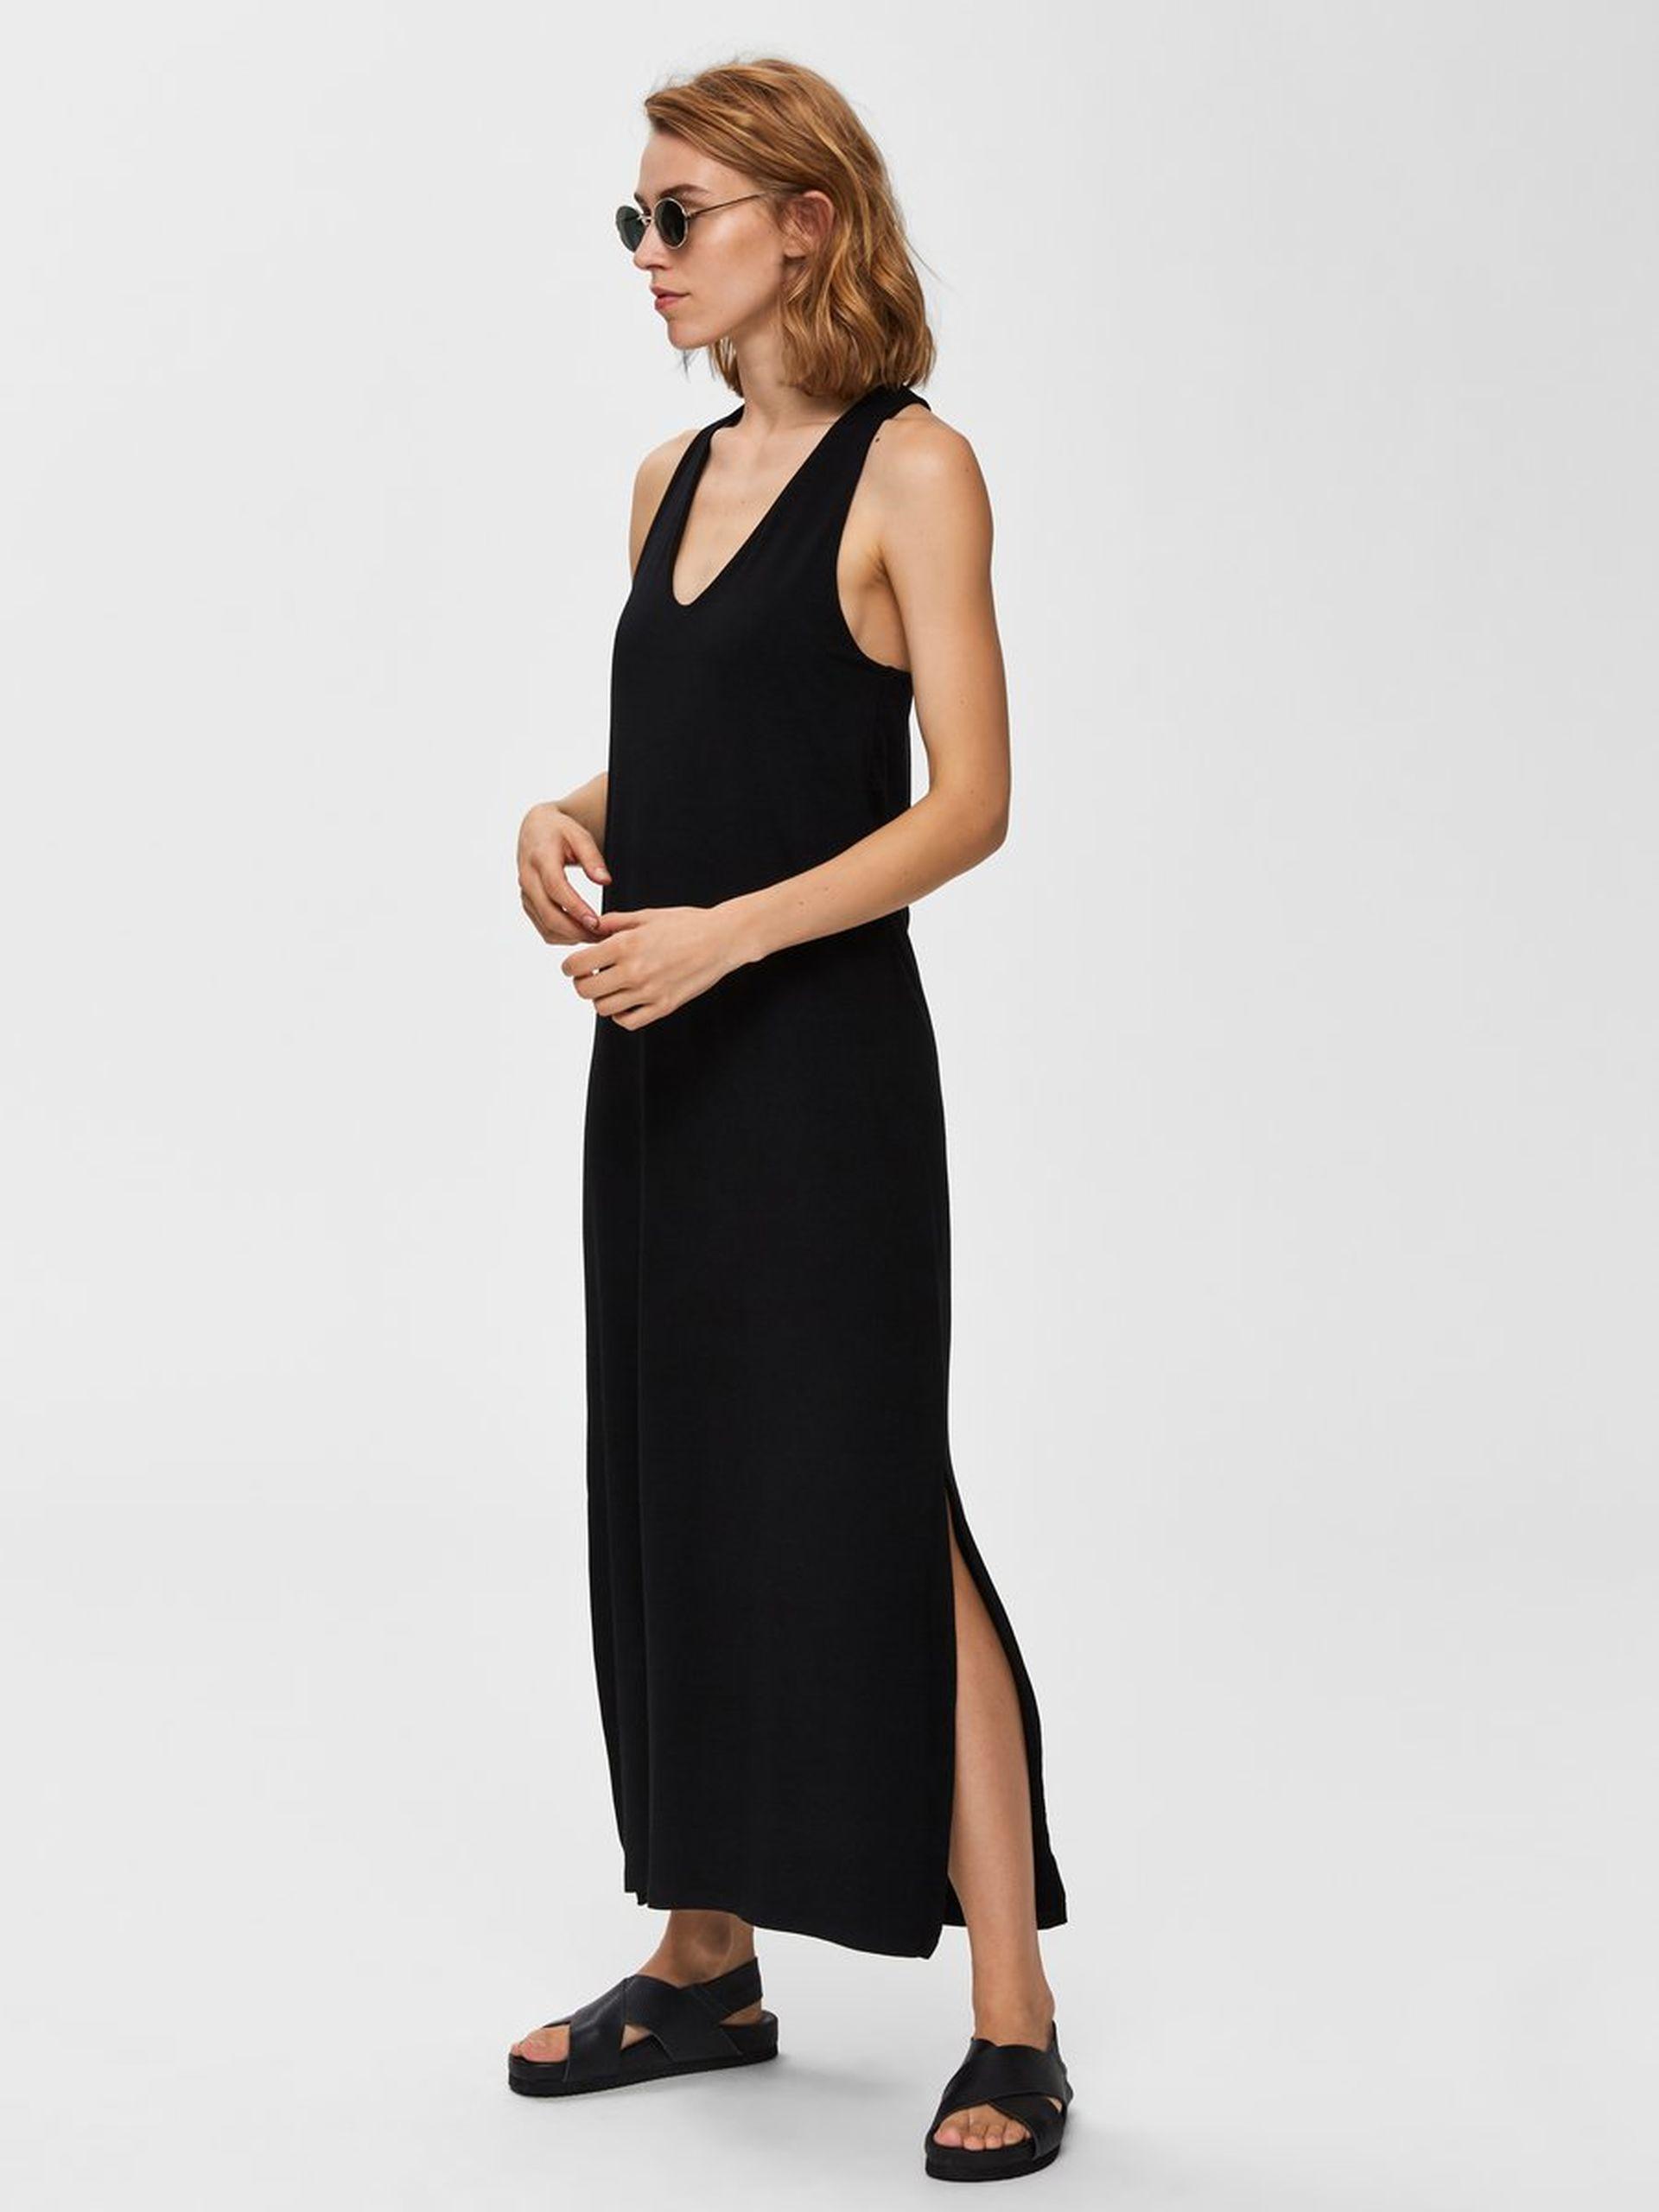 Ankle dress